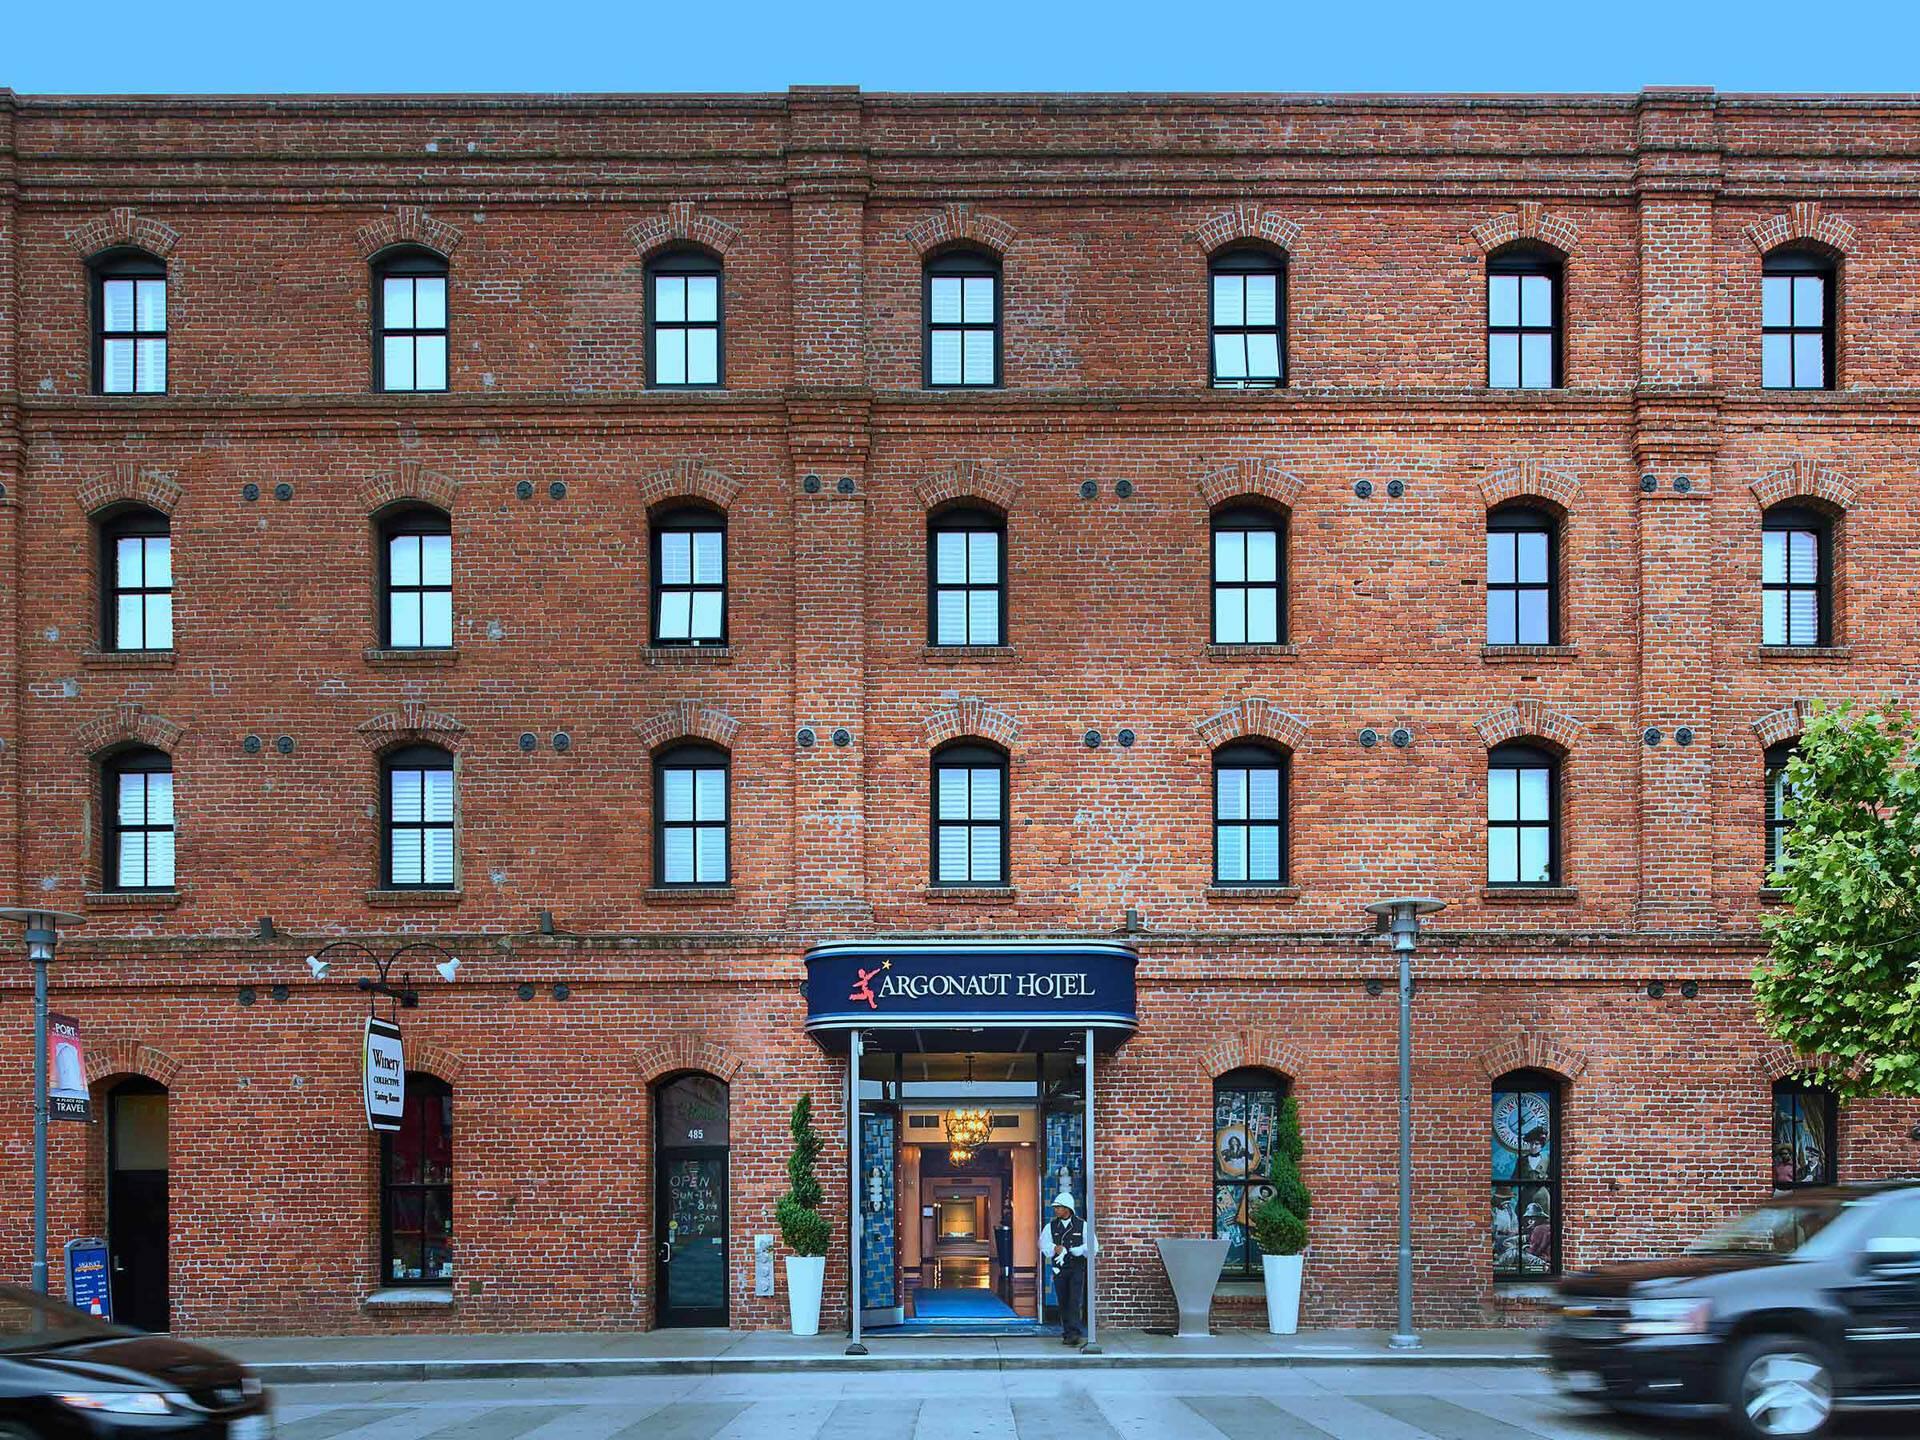 Argonaut Hotel Facade San Francisco Californie